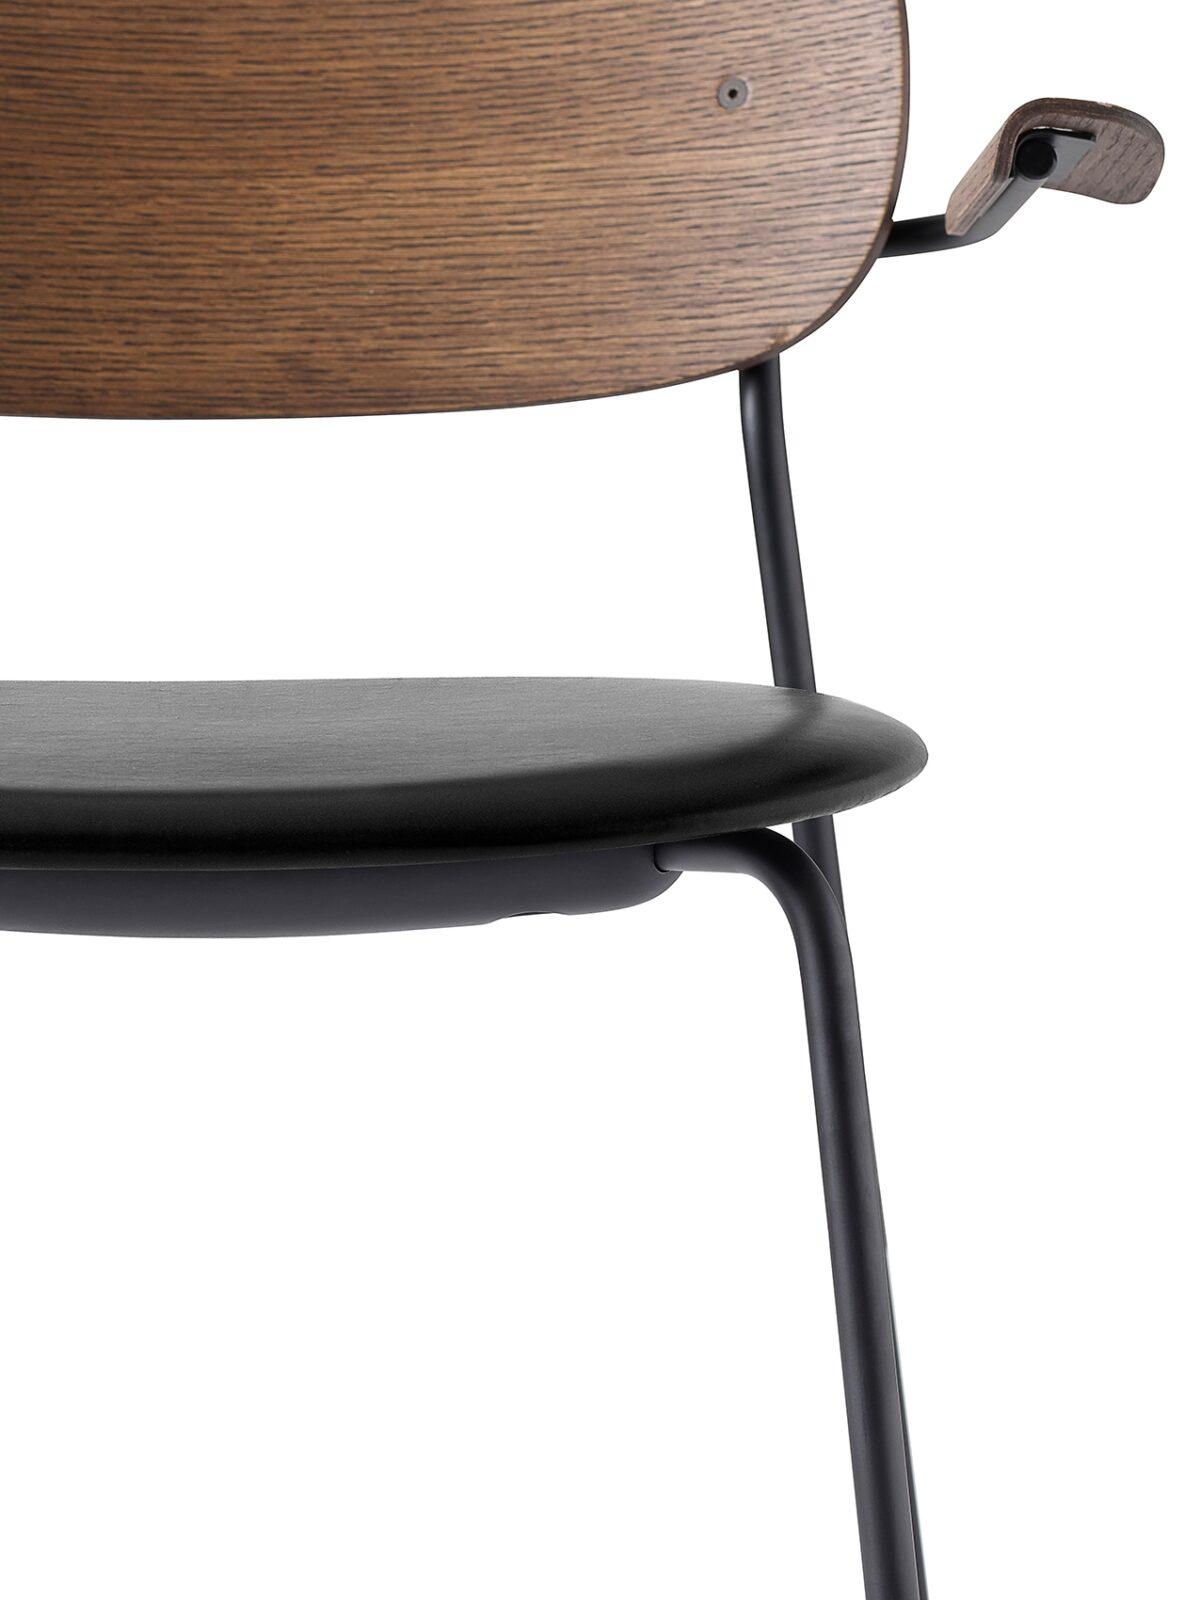 1169849 Co Dining Chair Armrest DakarBlack0842 DarkStainedOak Black CloseUp